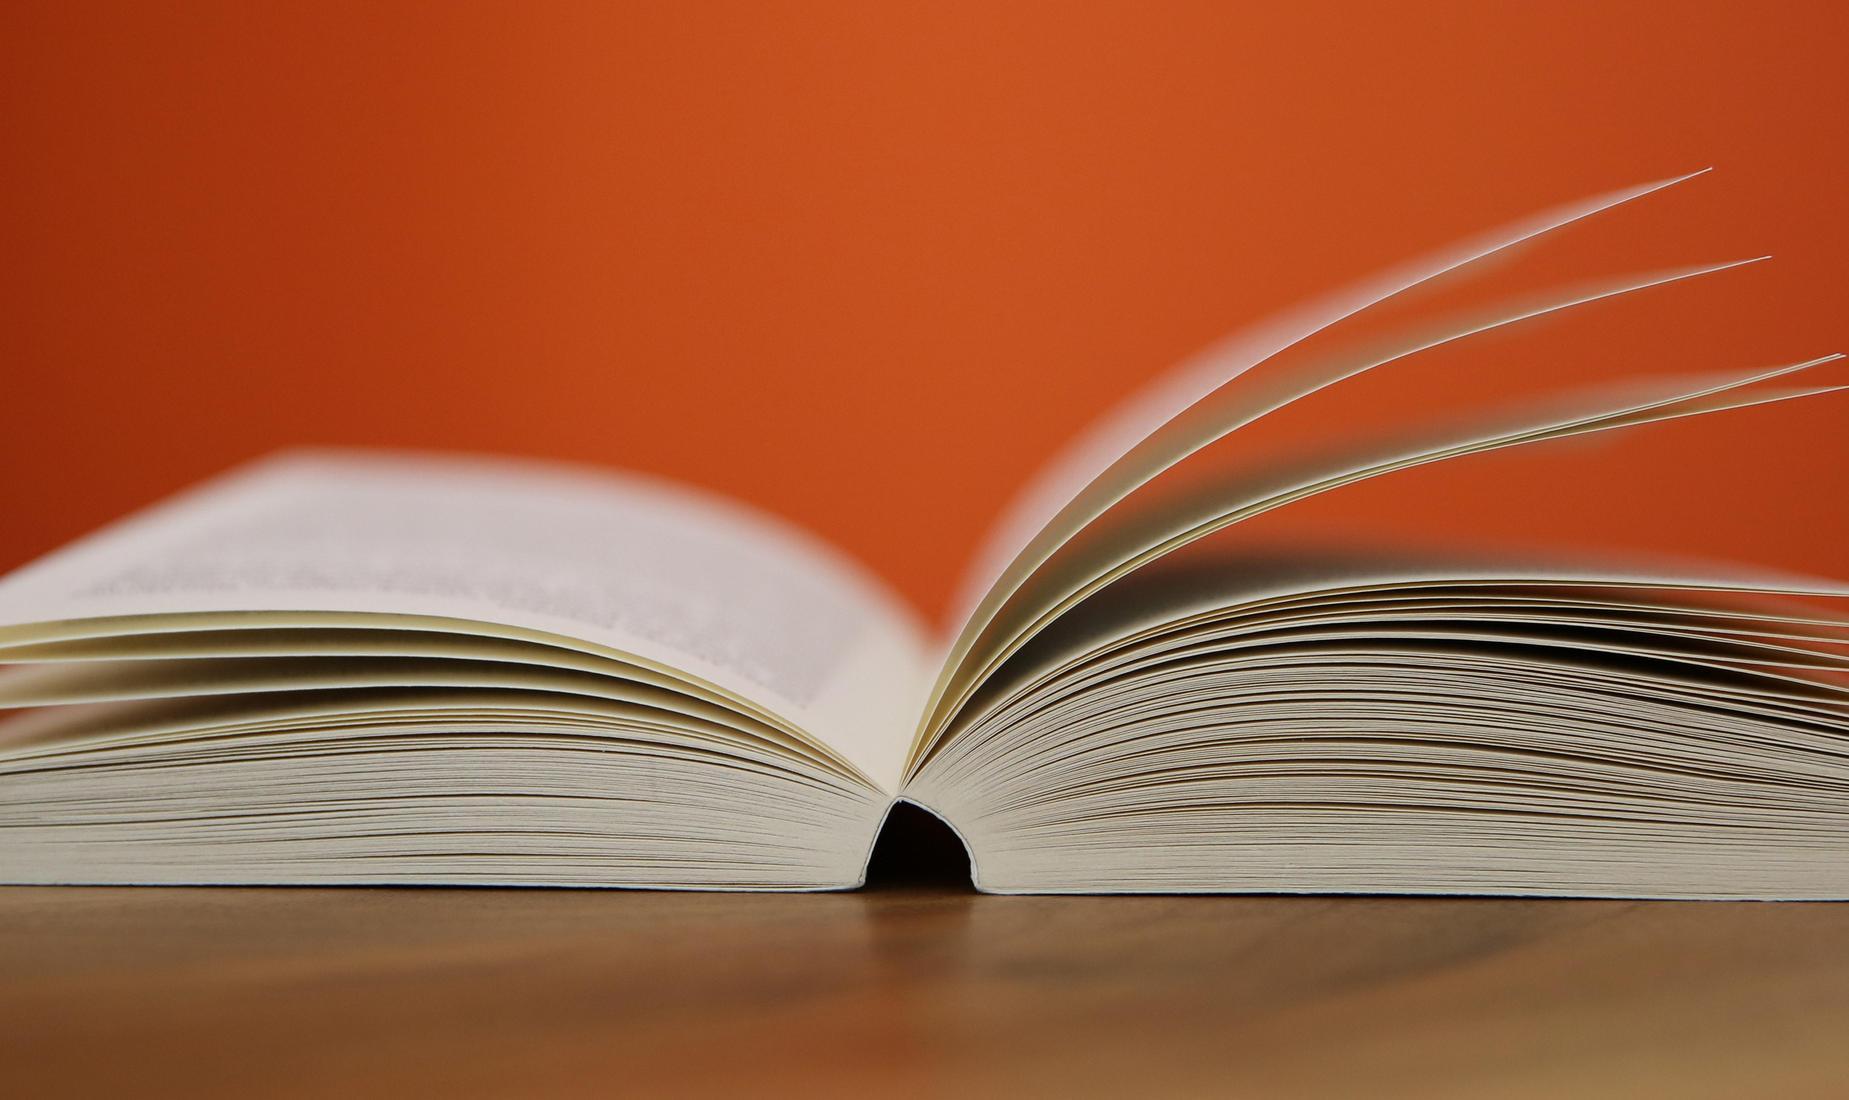 A School Textbook